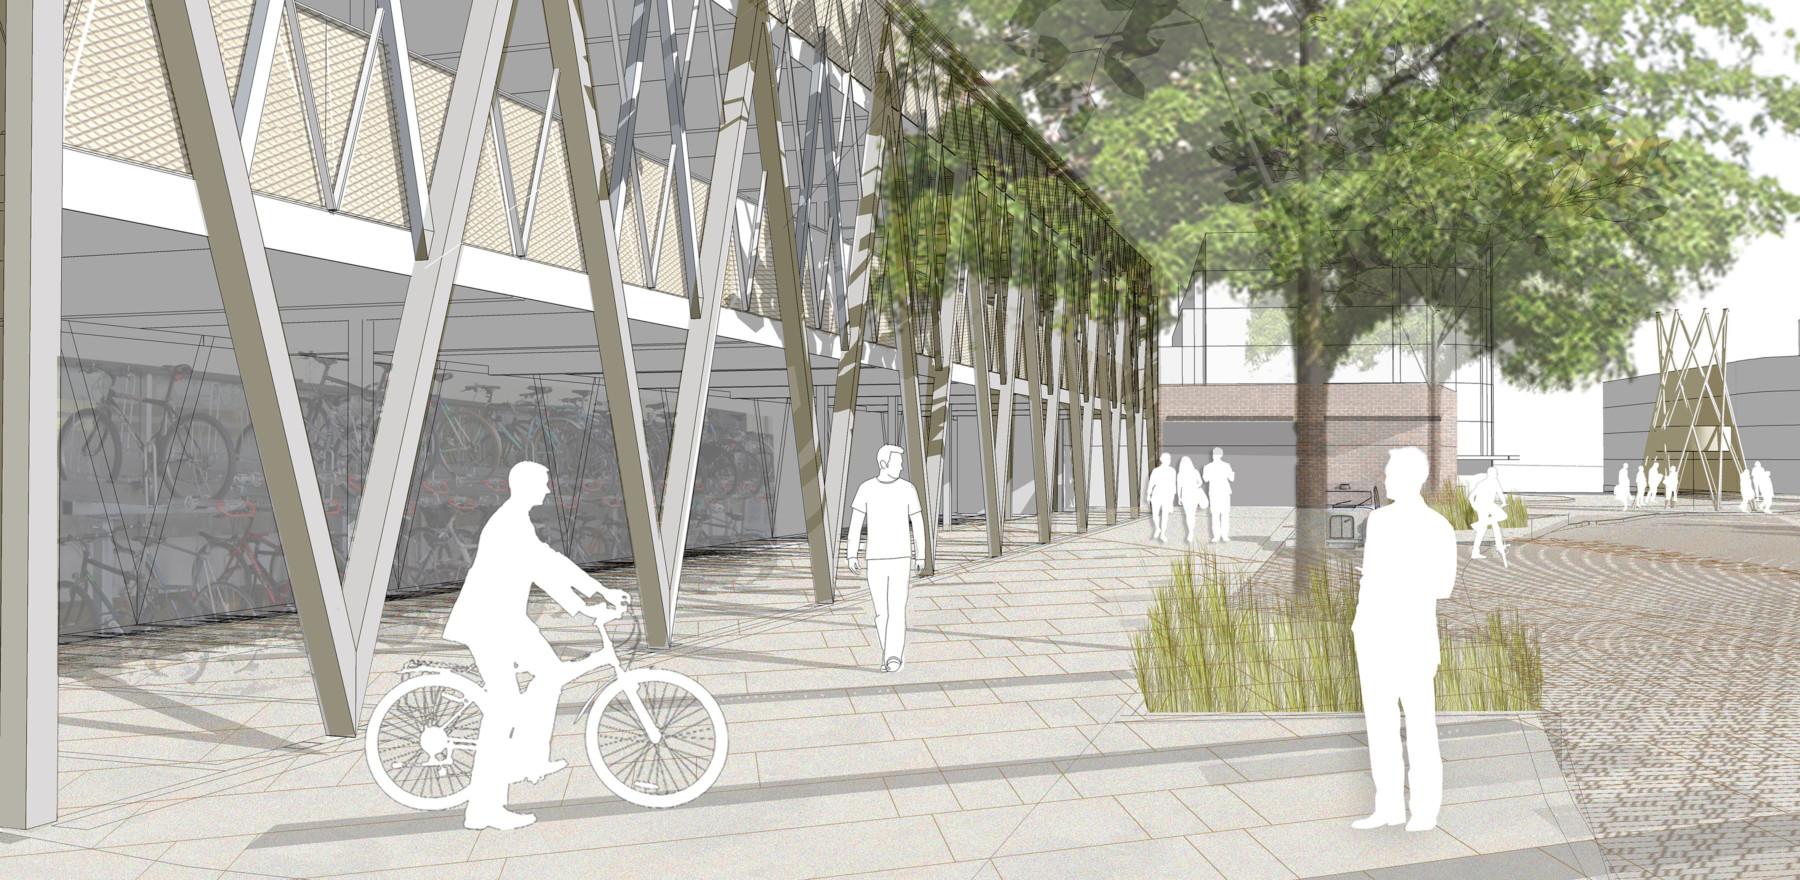 Sarah-Wigglesworth-Architects Kingston-Mini-Holland Hub 1 Main 3600